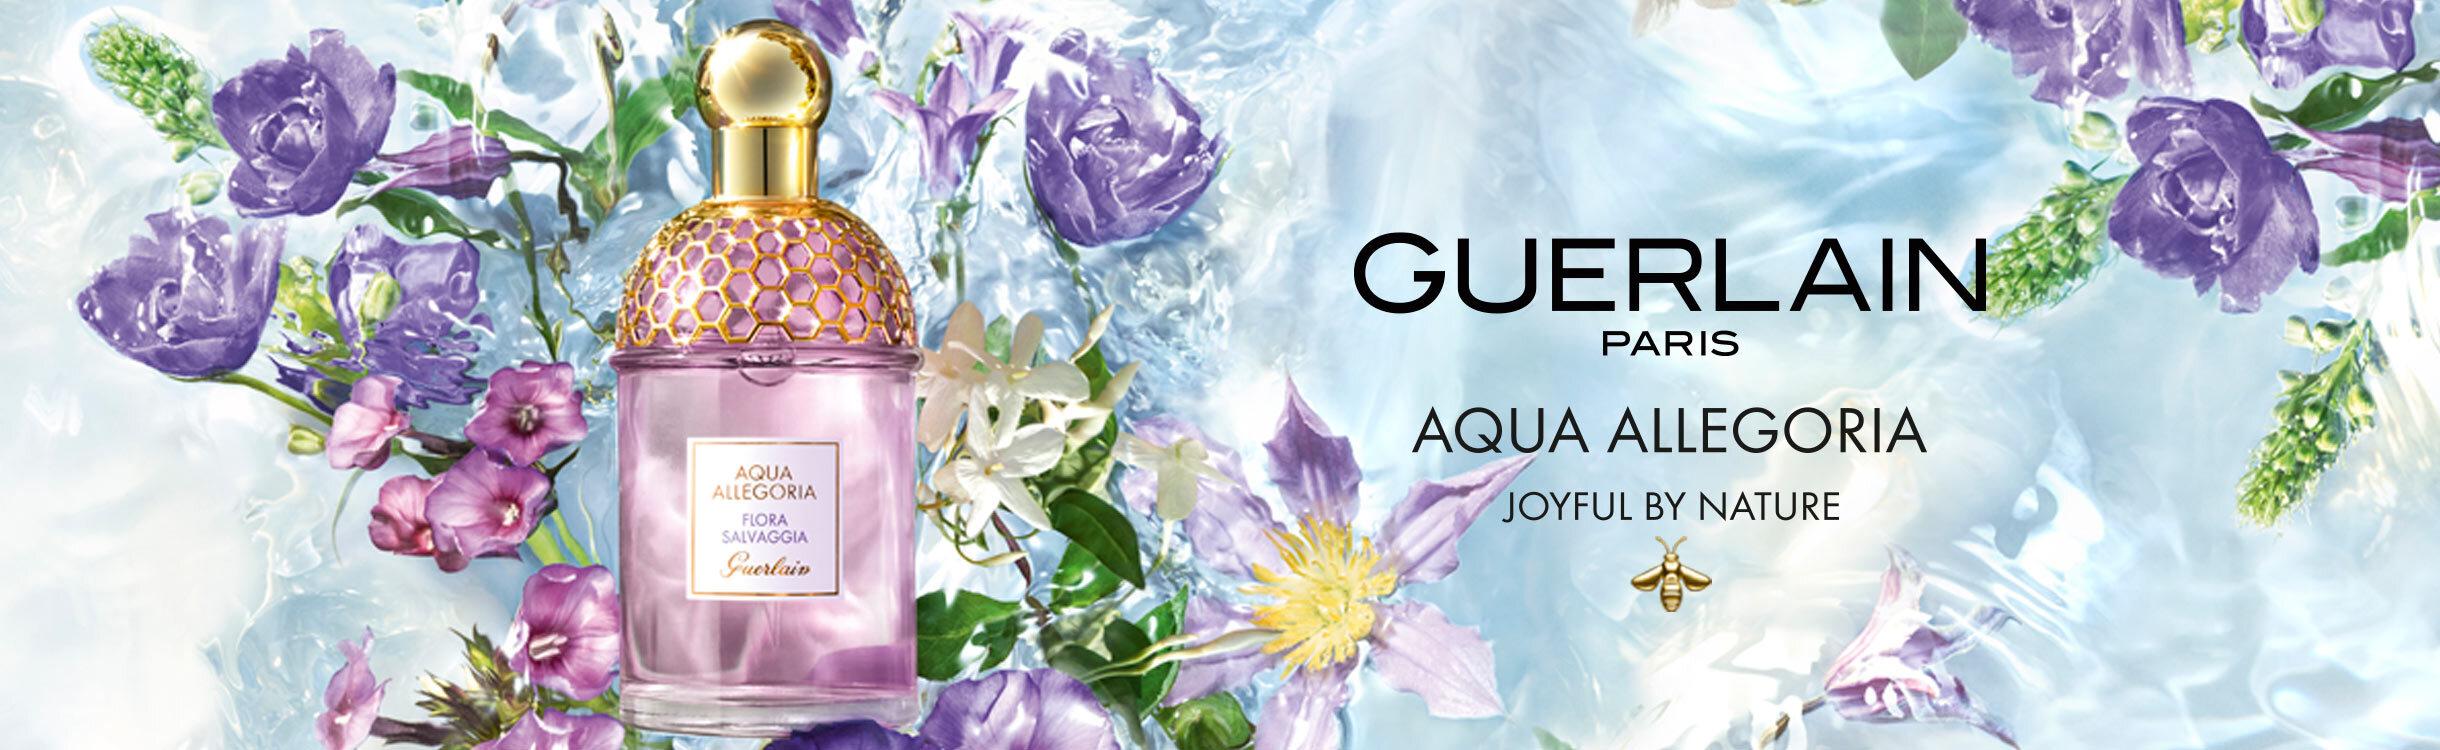 Perfumes e Perfumaria Guerlain Masculinos